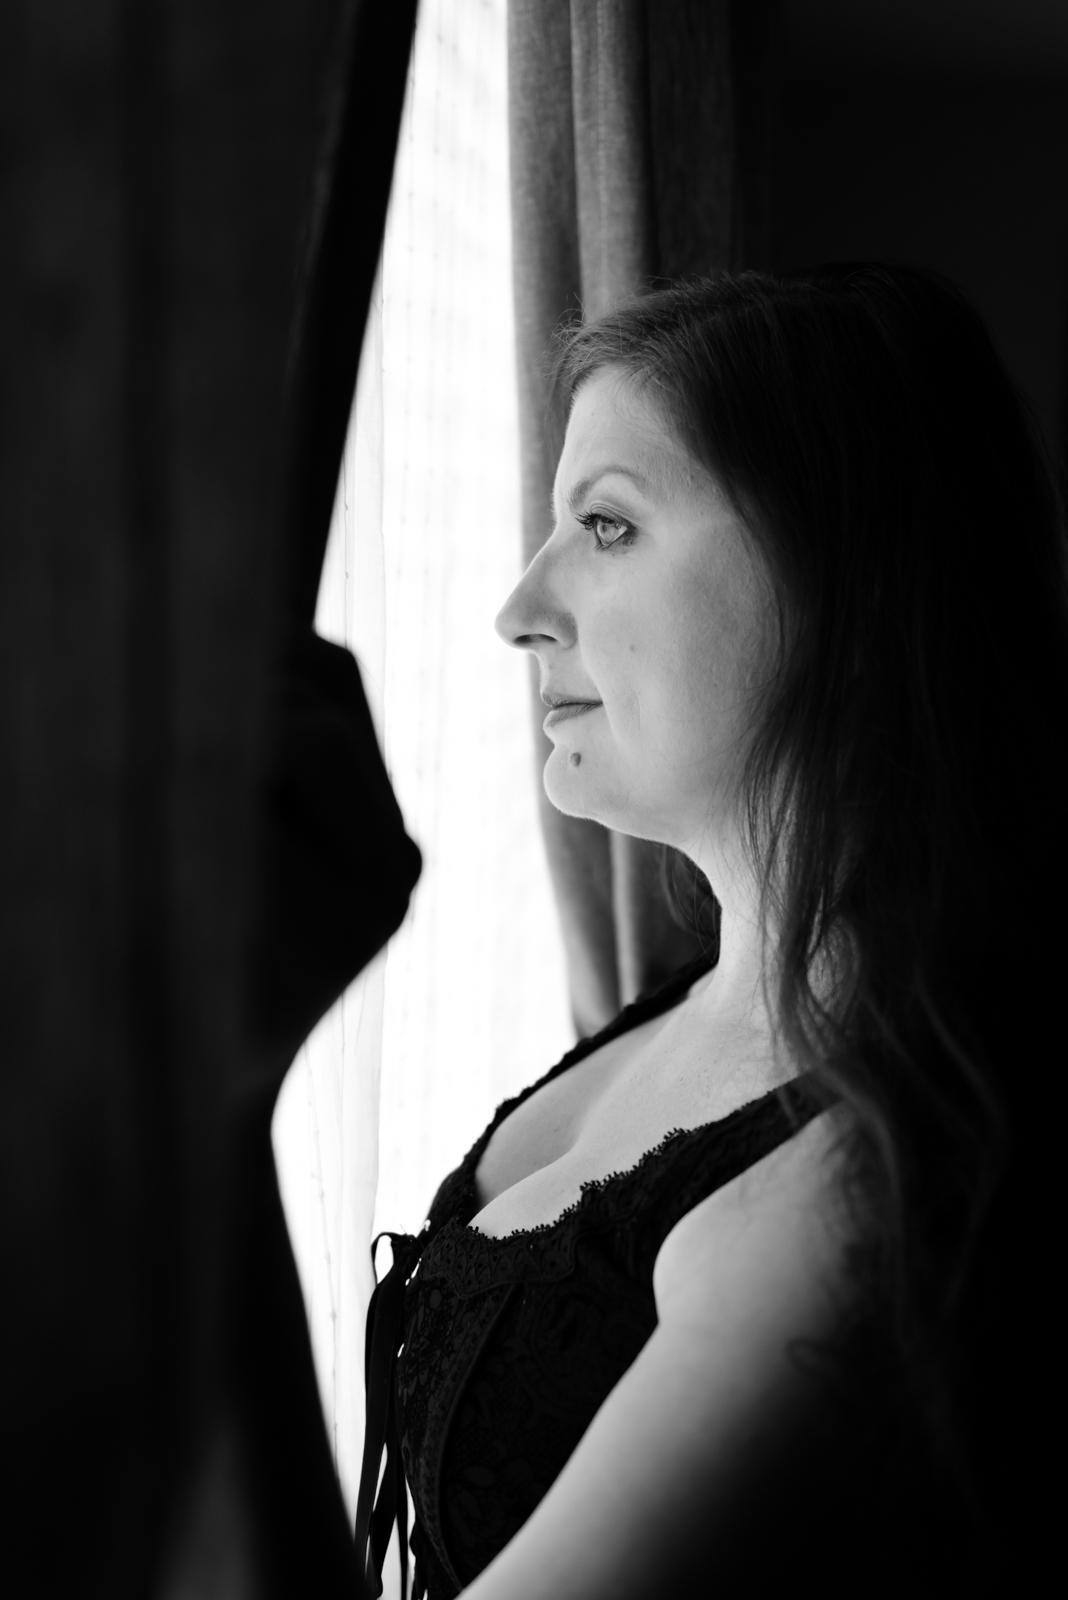 boudoir-photography-vancouver-washington-windows